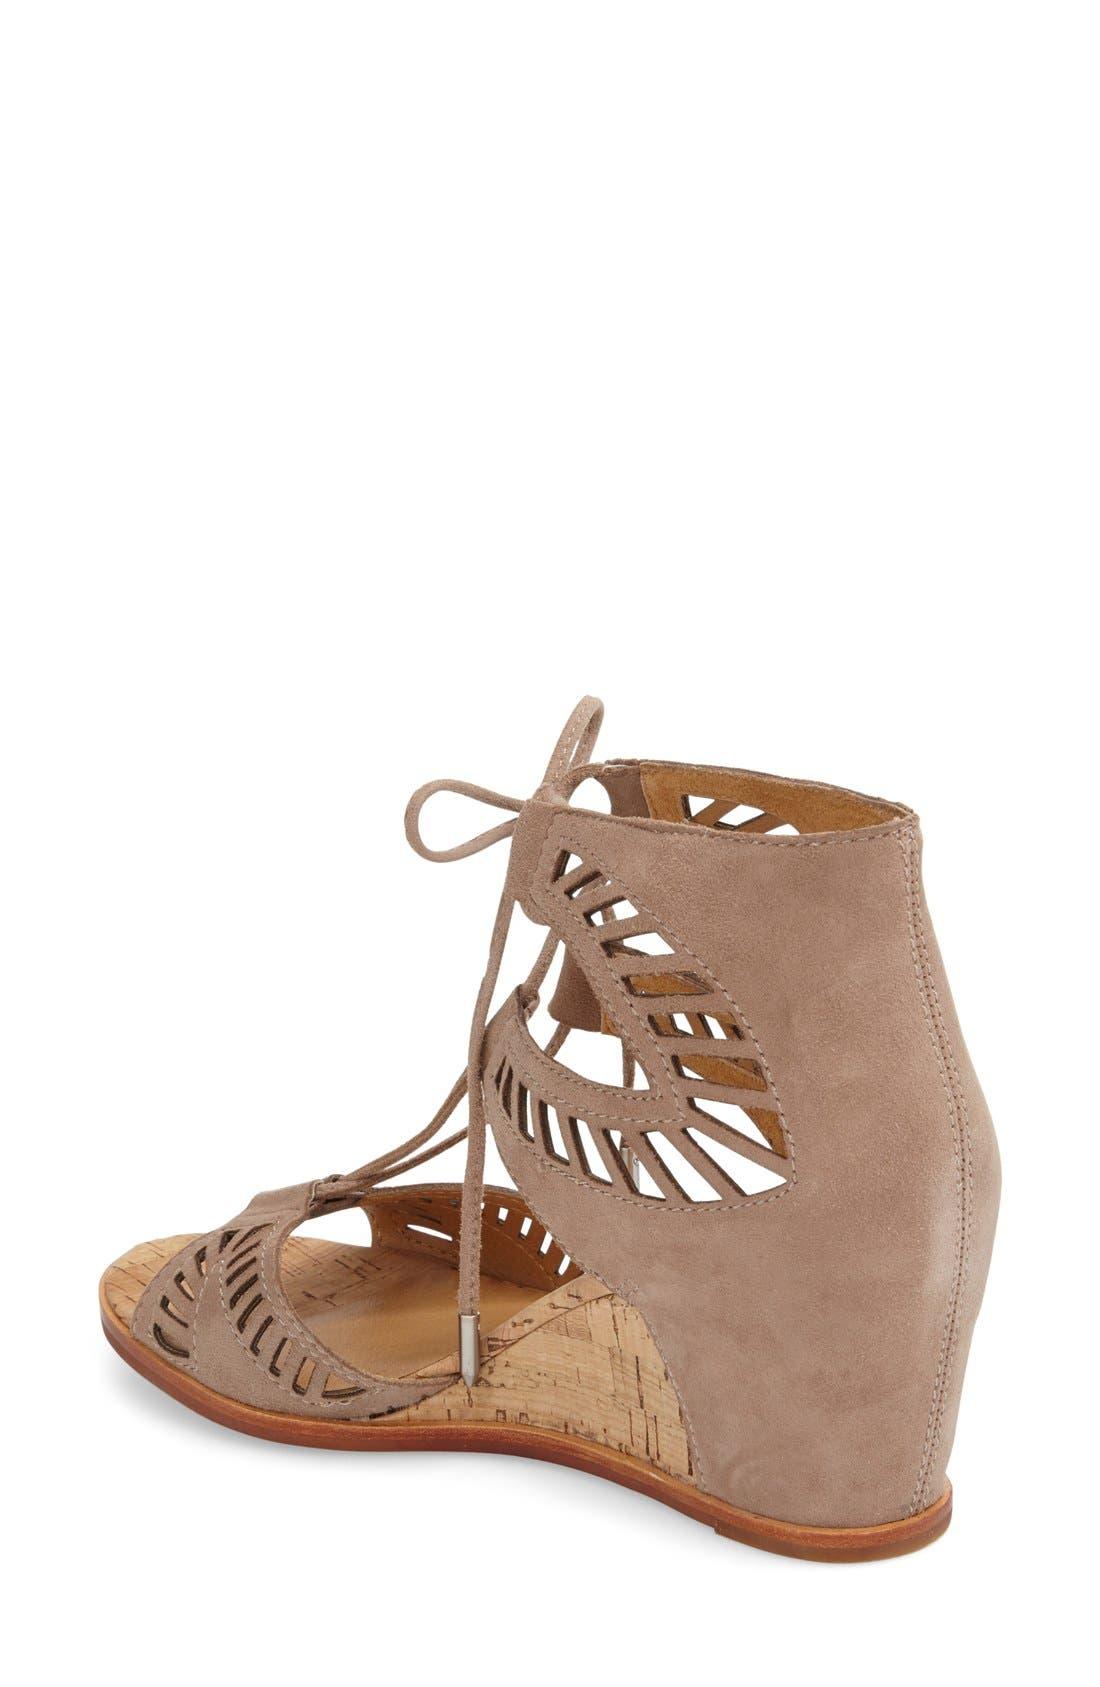 Alternate Image 2  - Dolce Vita 'Linsey' Lace-Up Wedge Sandal (Women)